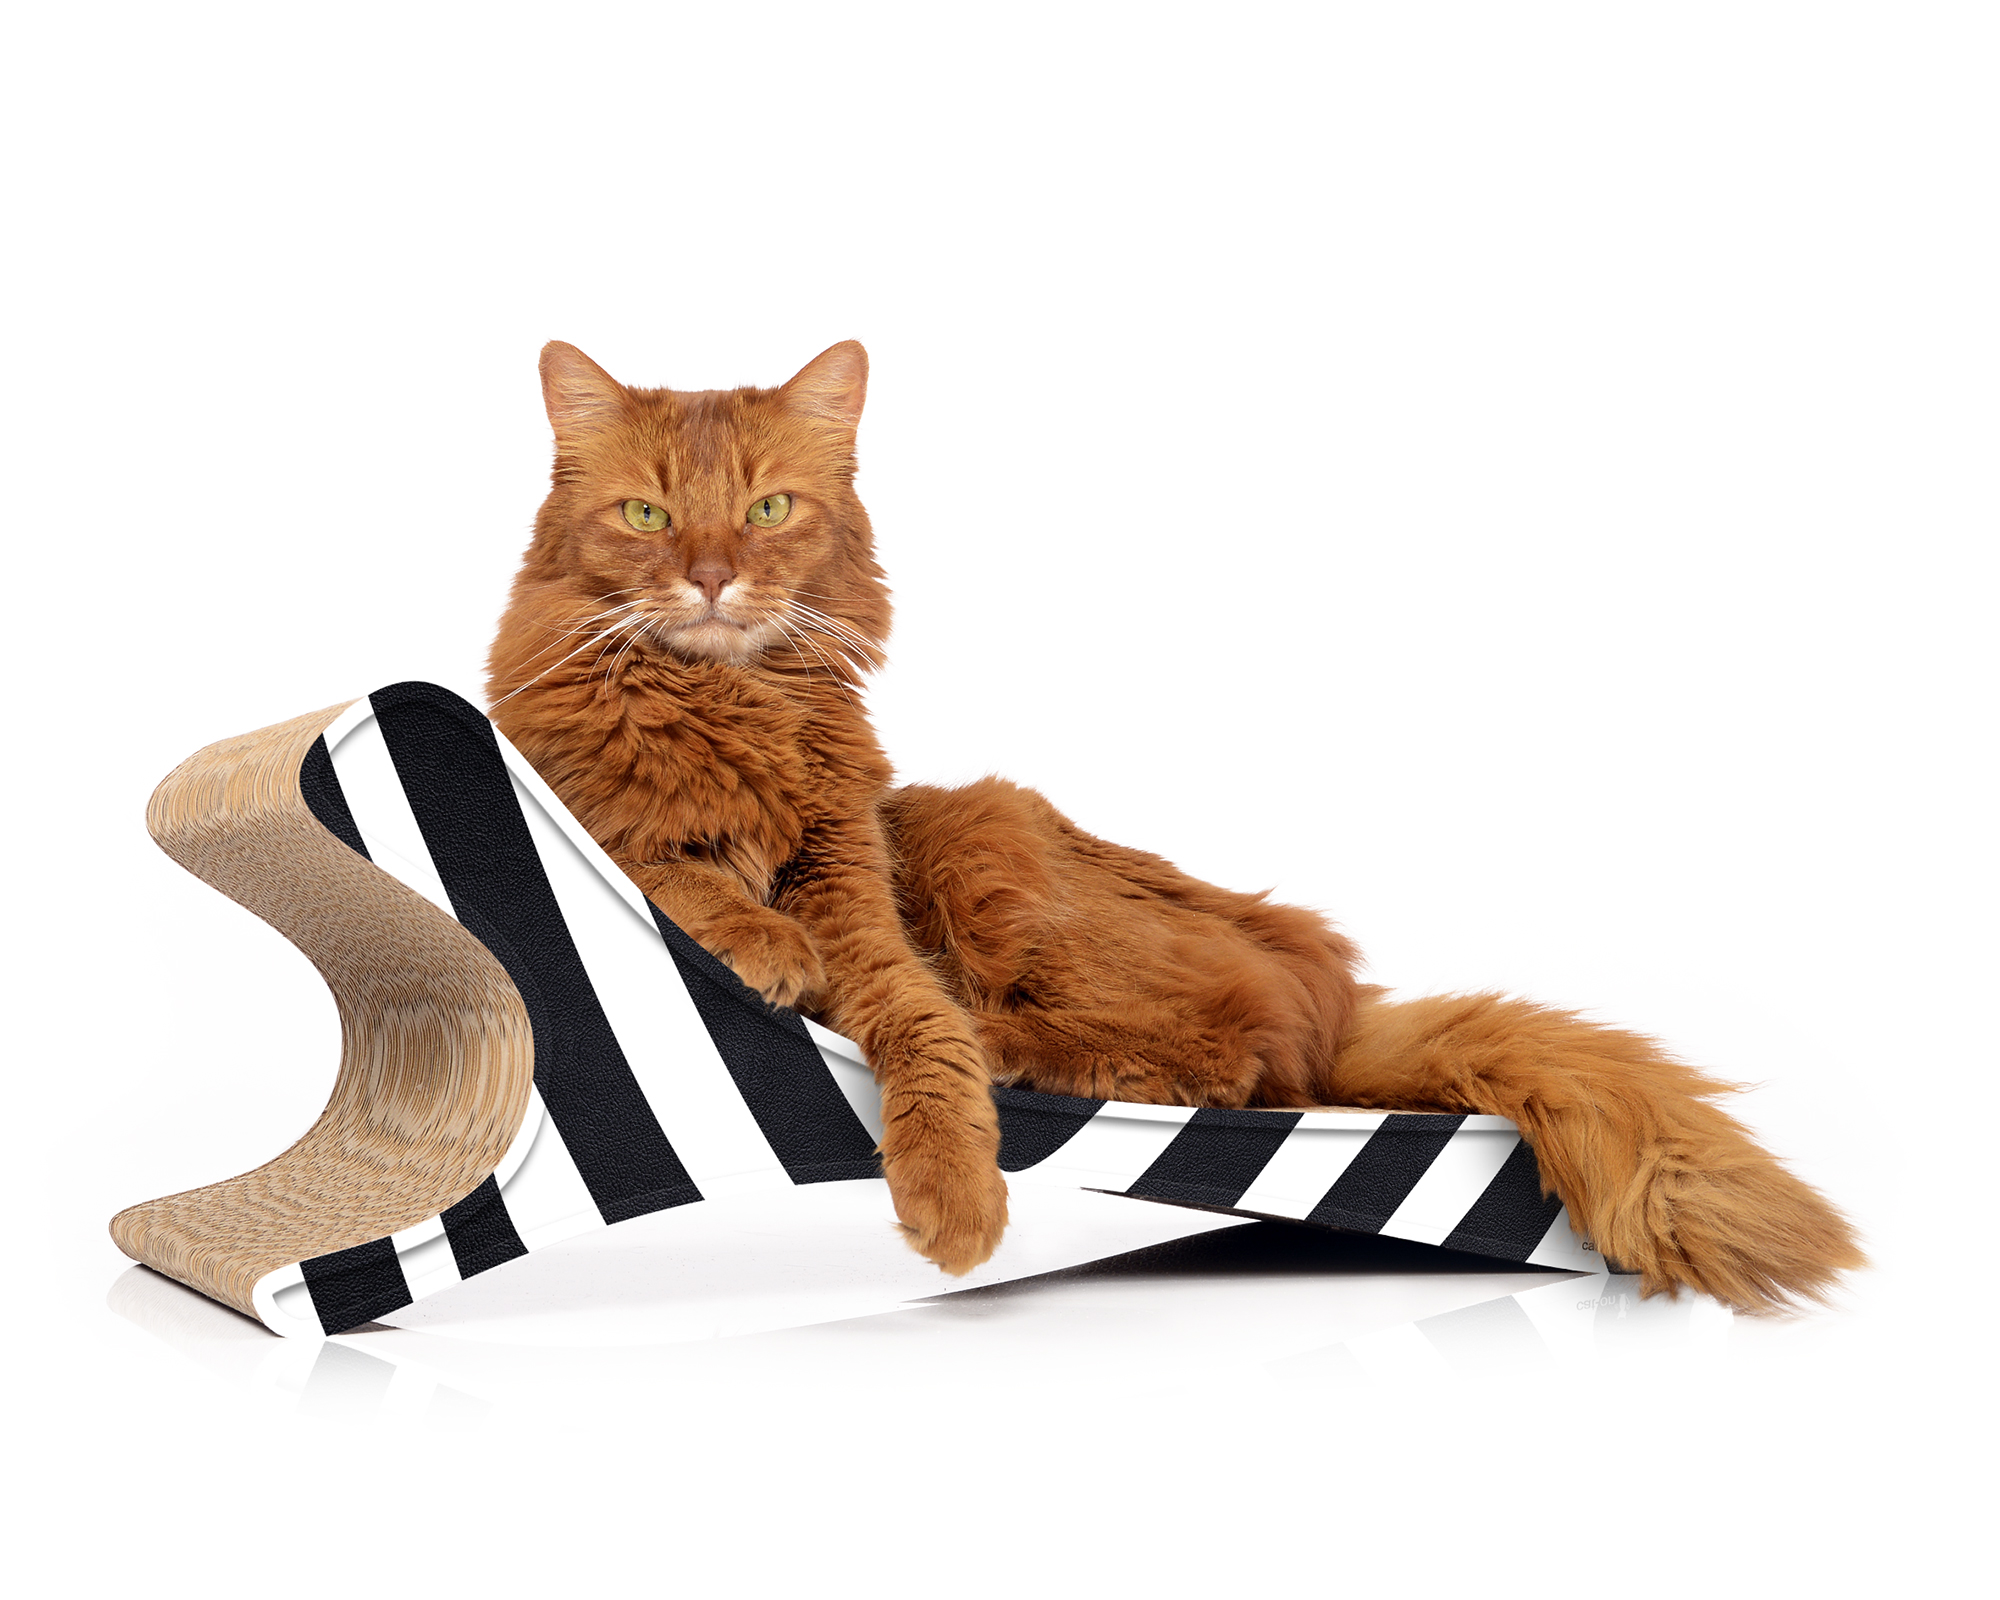 cardboard cat scratcher Feline